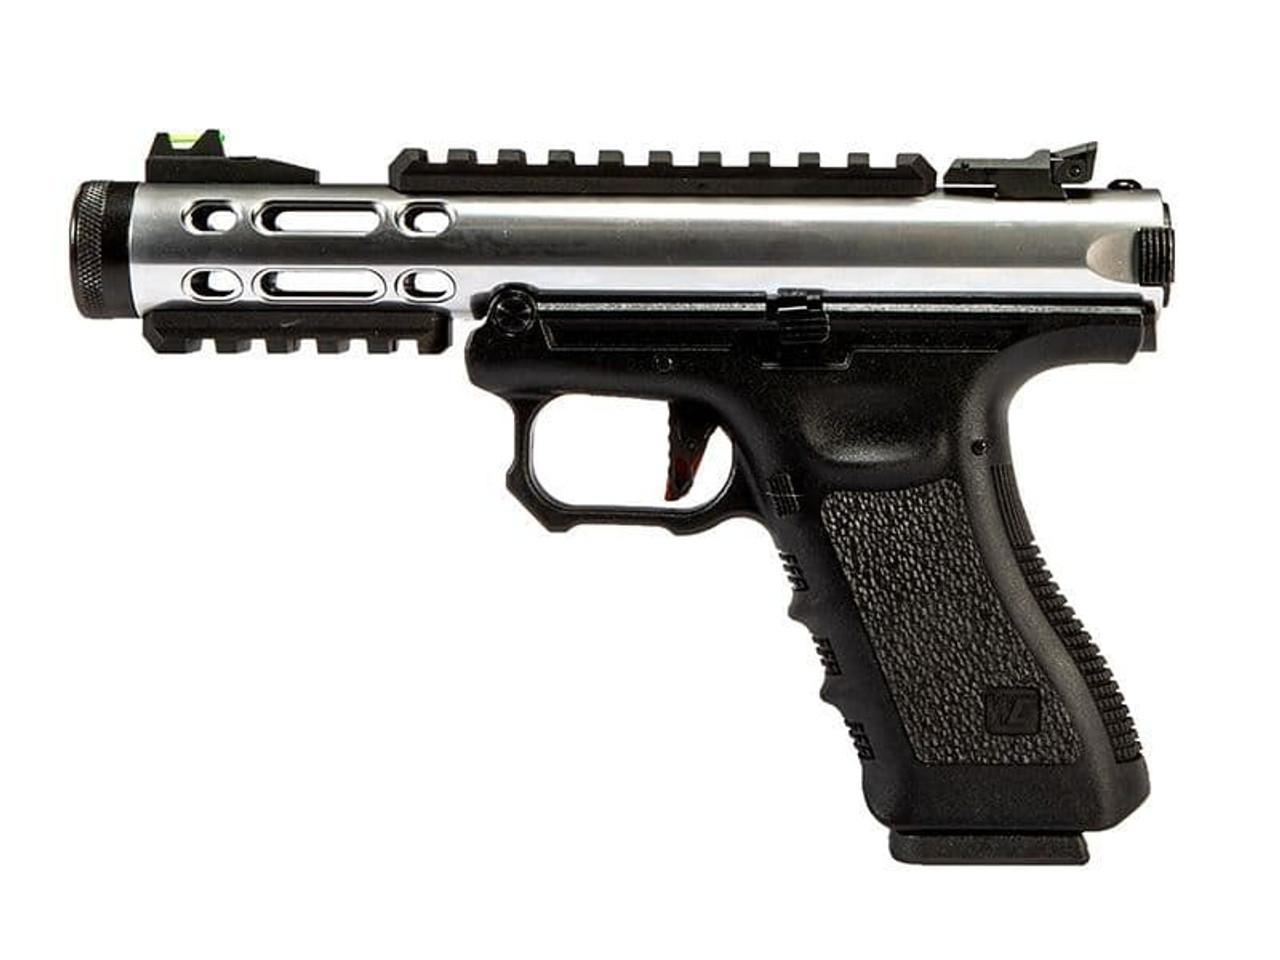 WE Galaxy G Series GBB Pistol - Silver